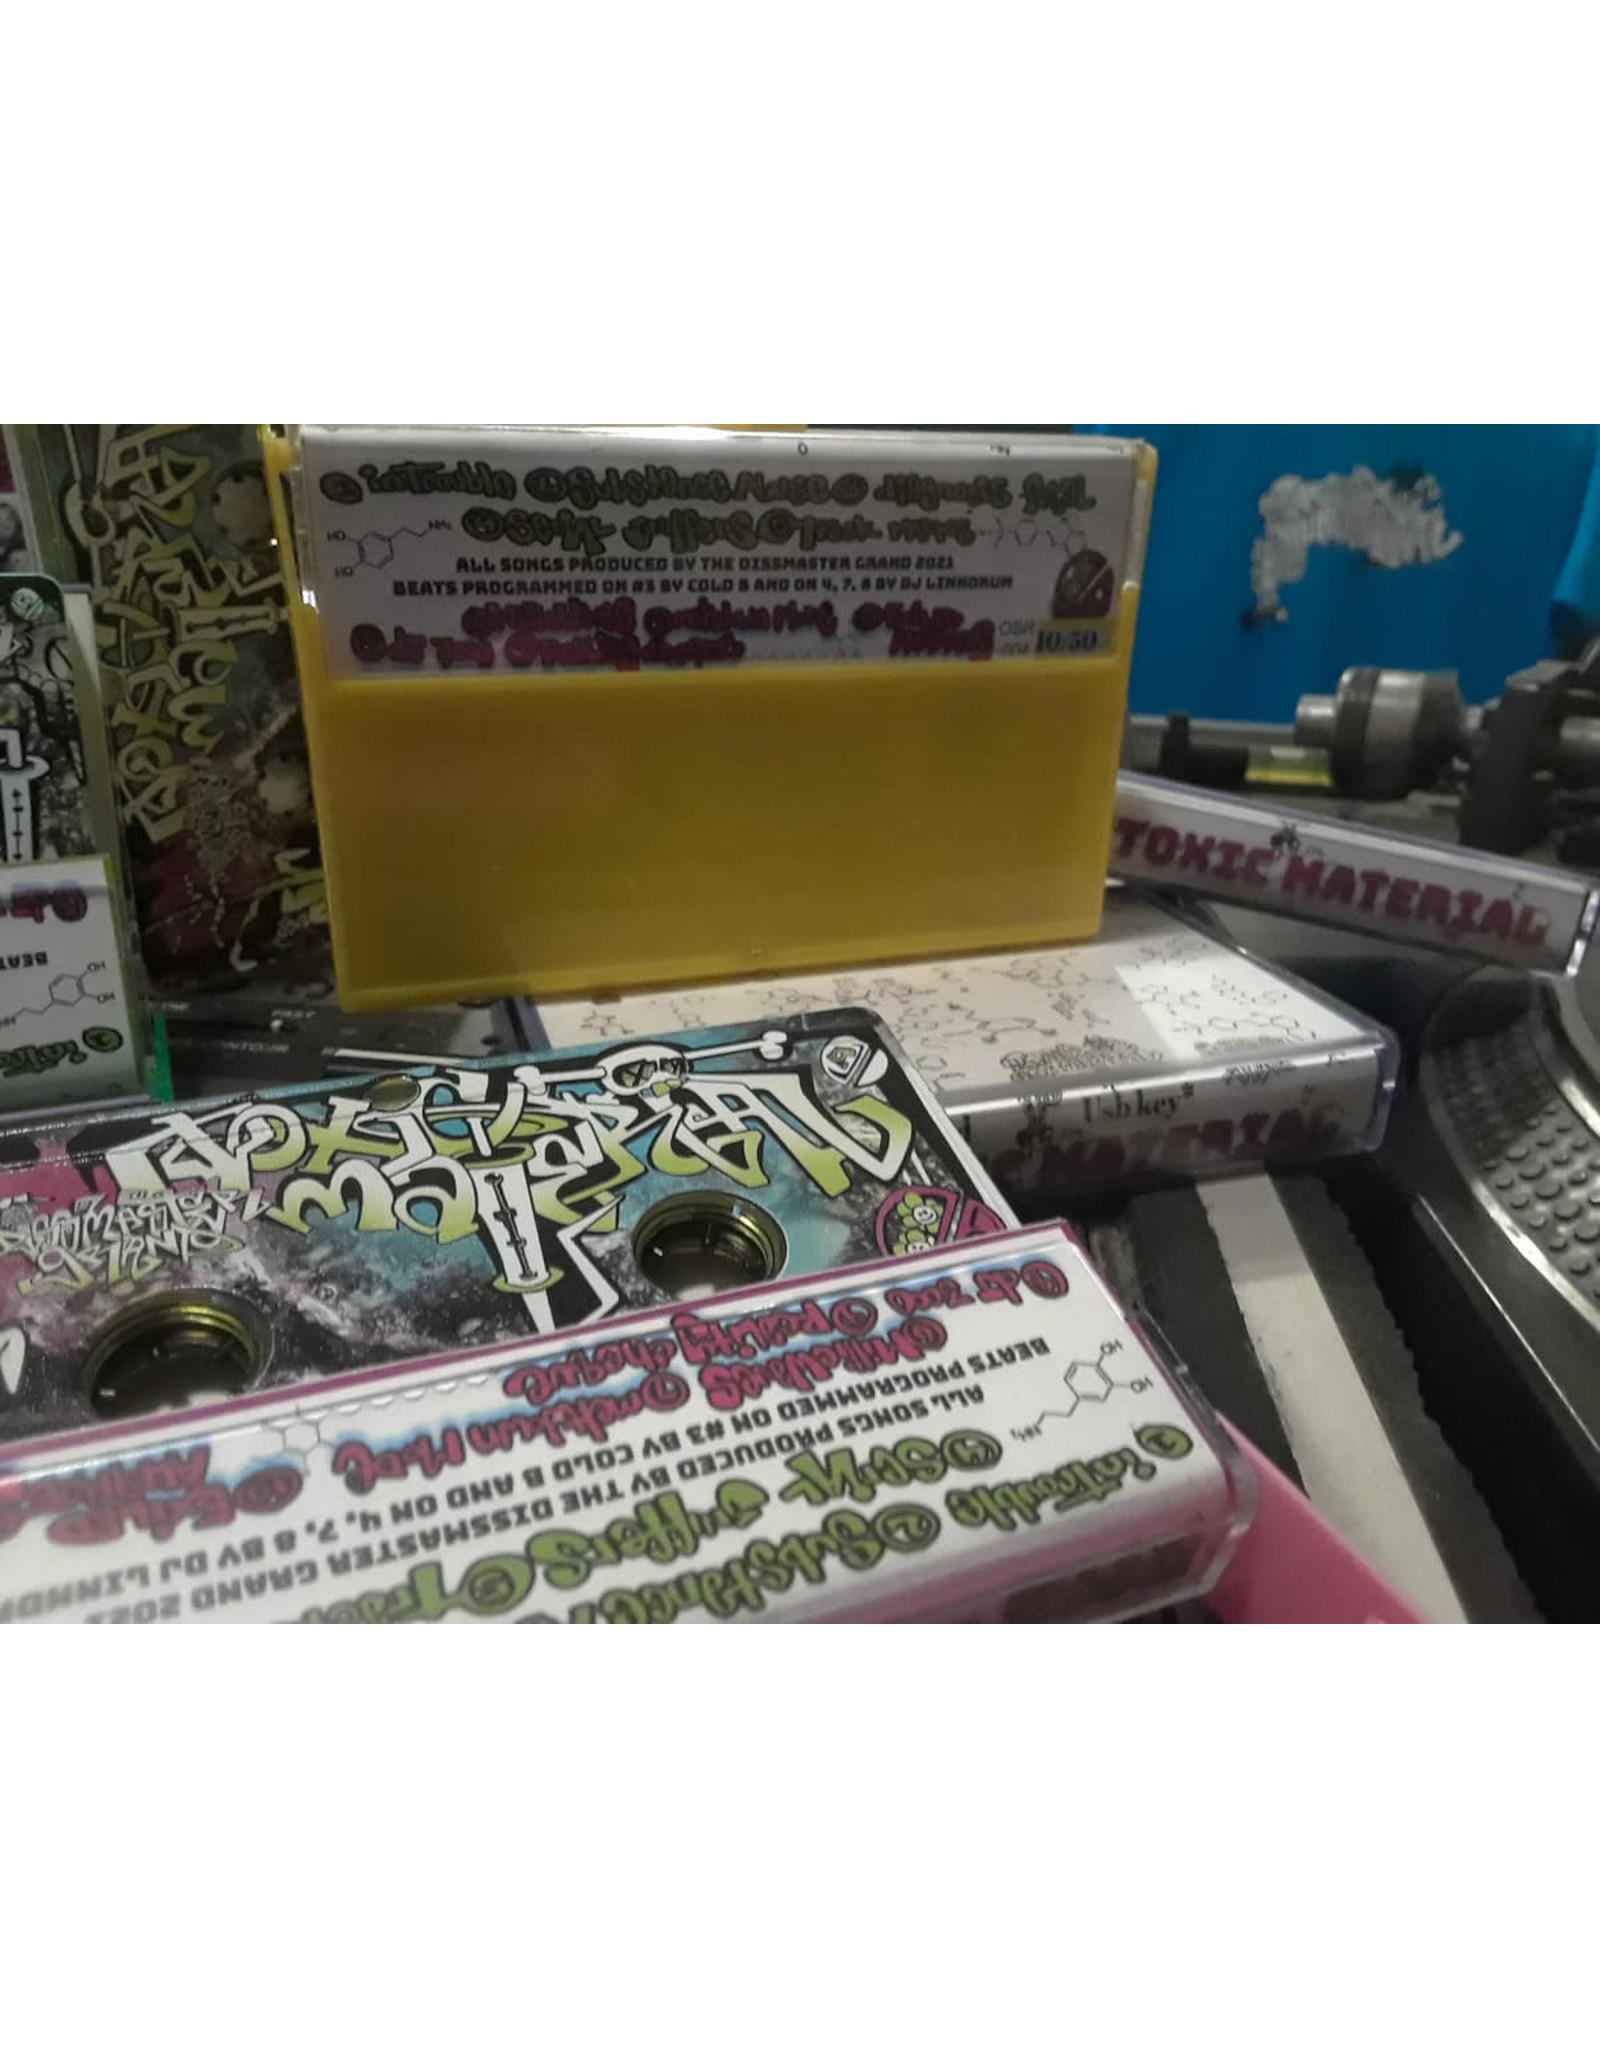 Dissmaster Grand - Toxic Material CASSETTE